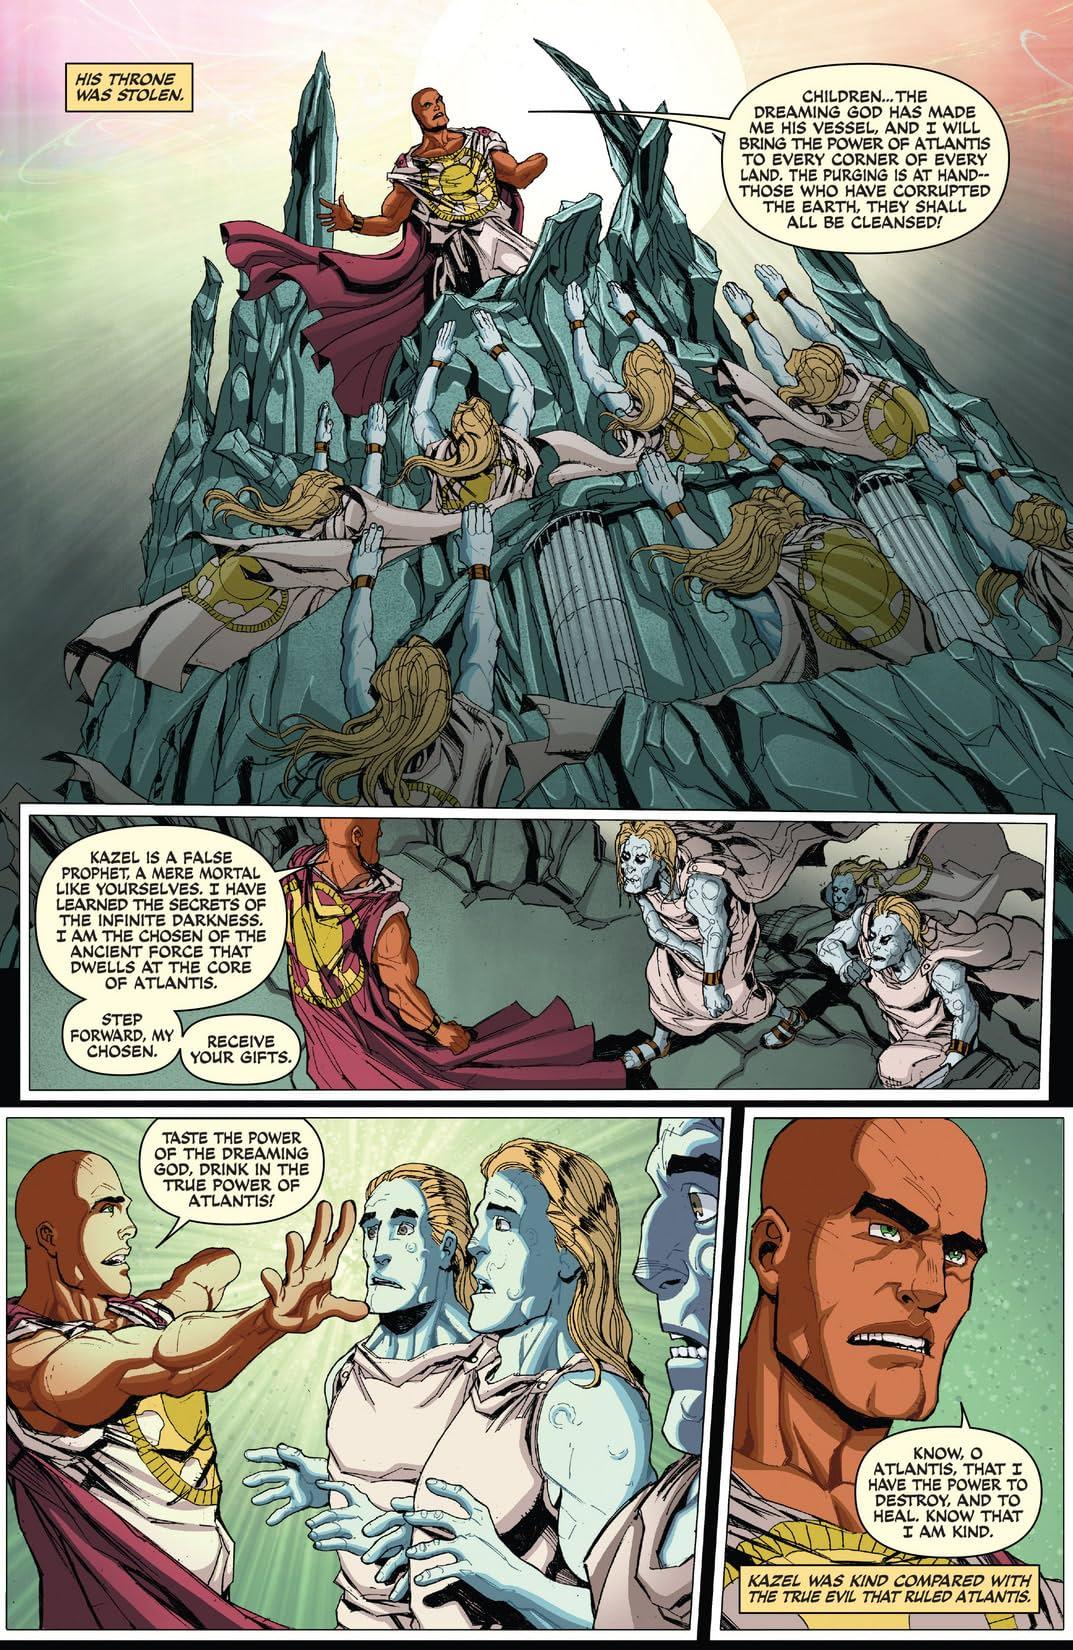 Red Sonja: Atlantis Rises #3